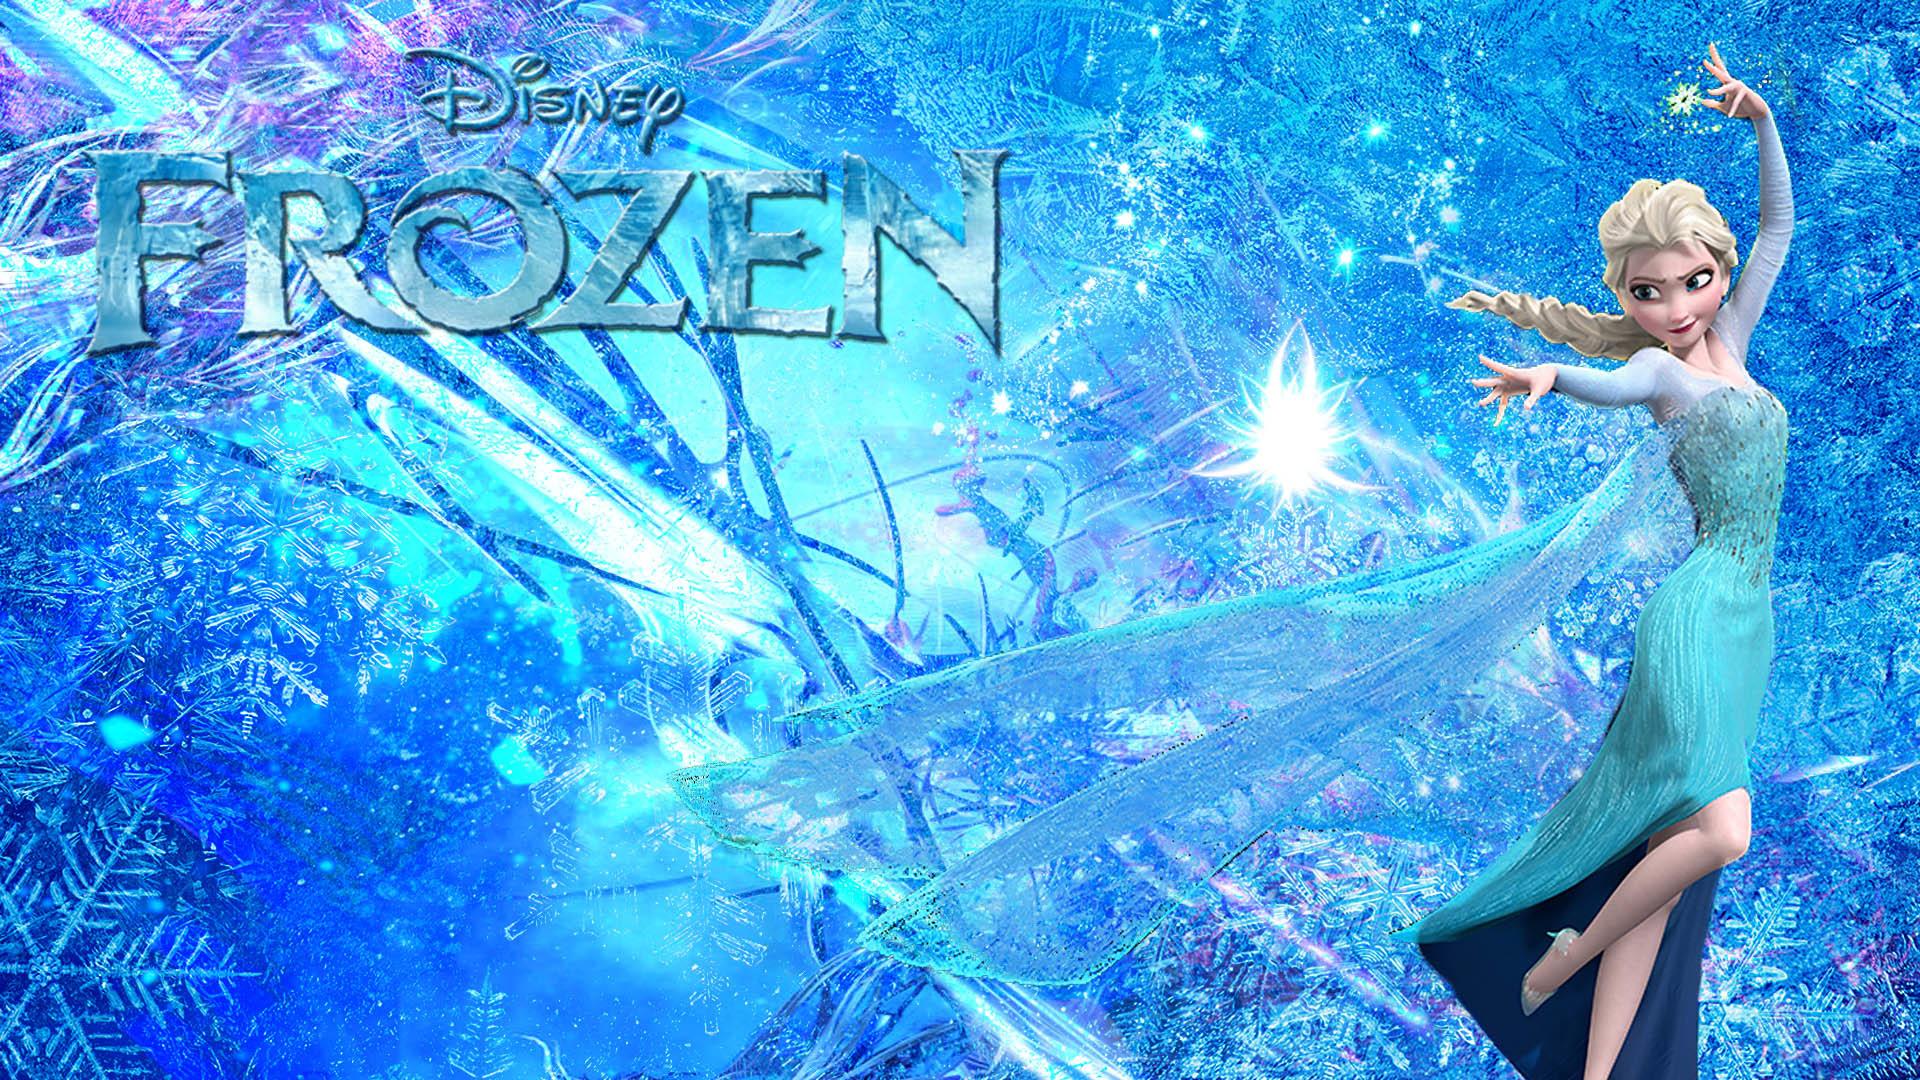 1920x1080 Elsa The Snow Queen Image